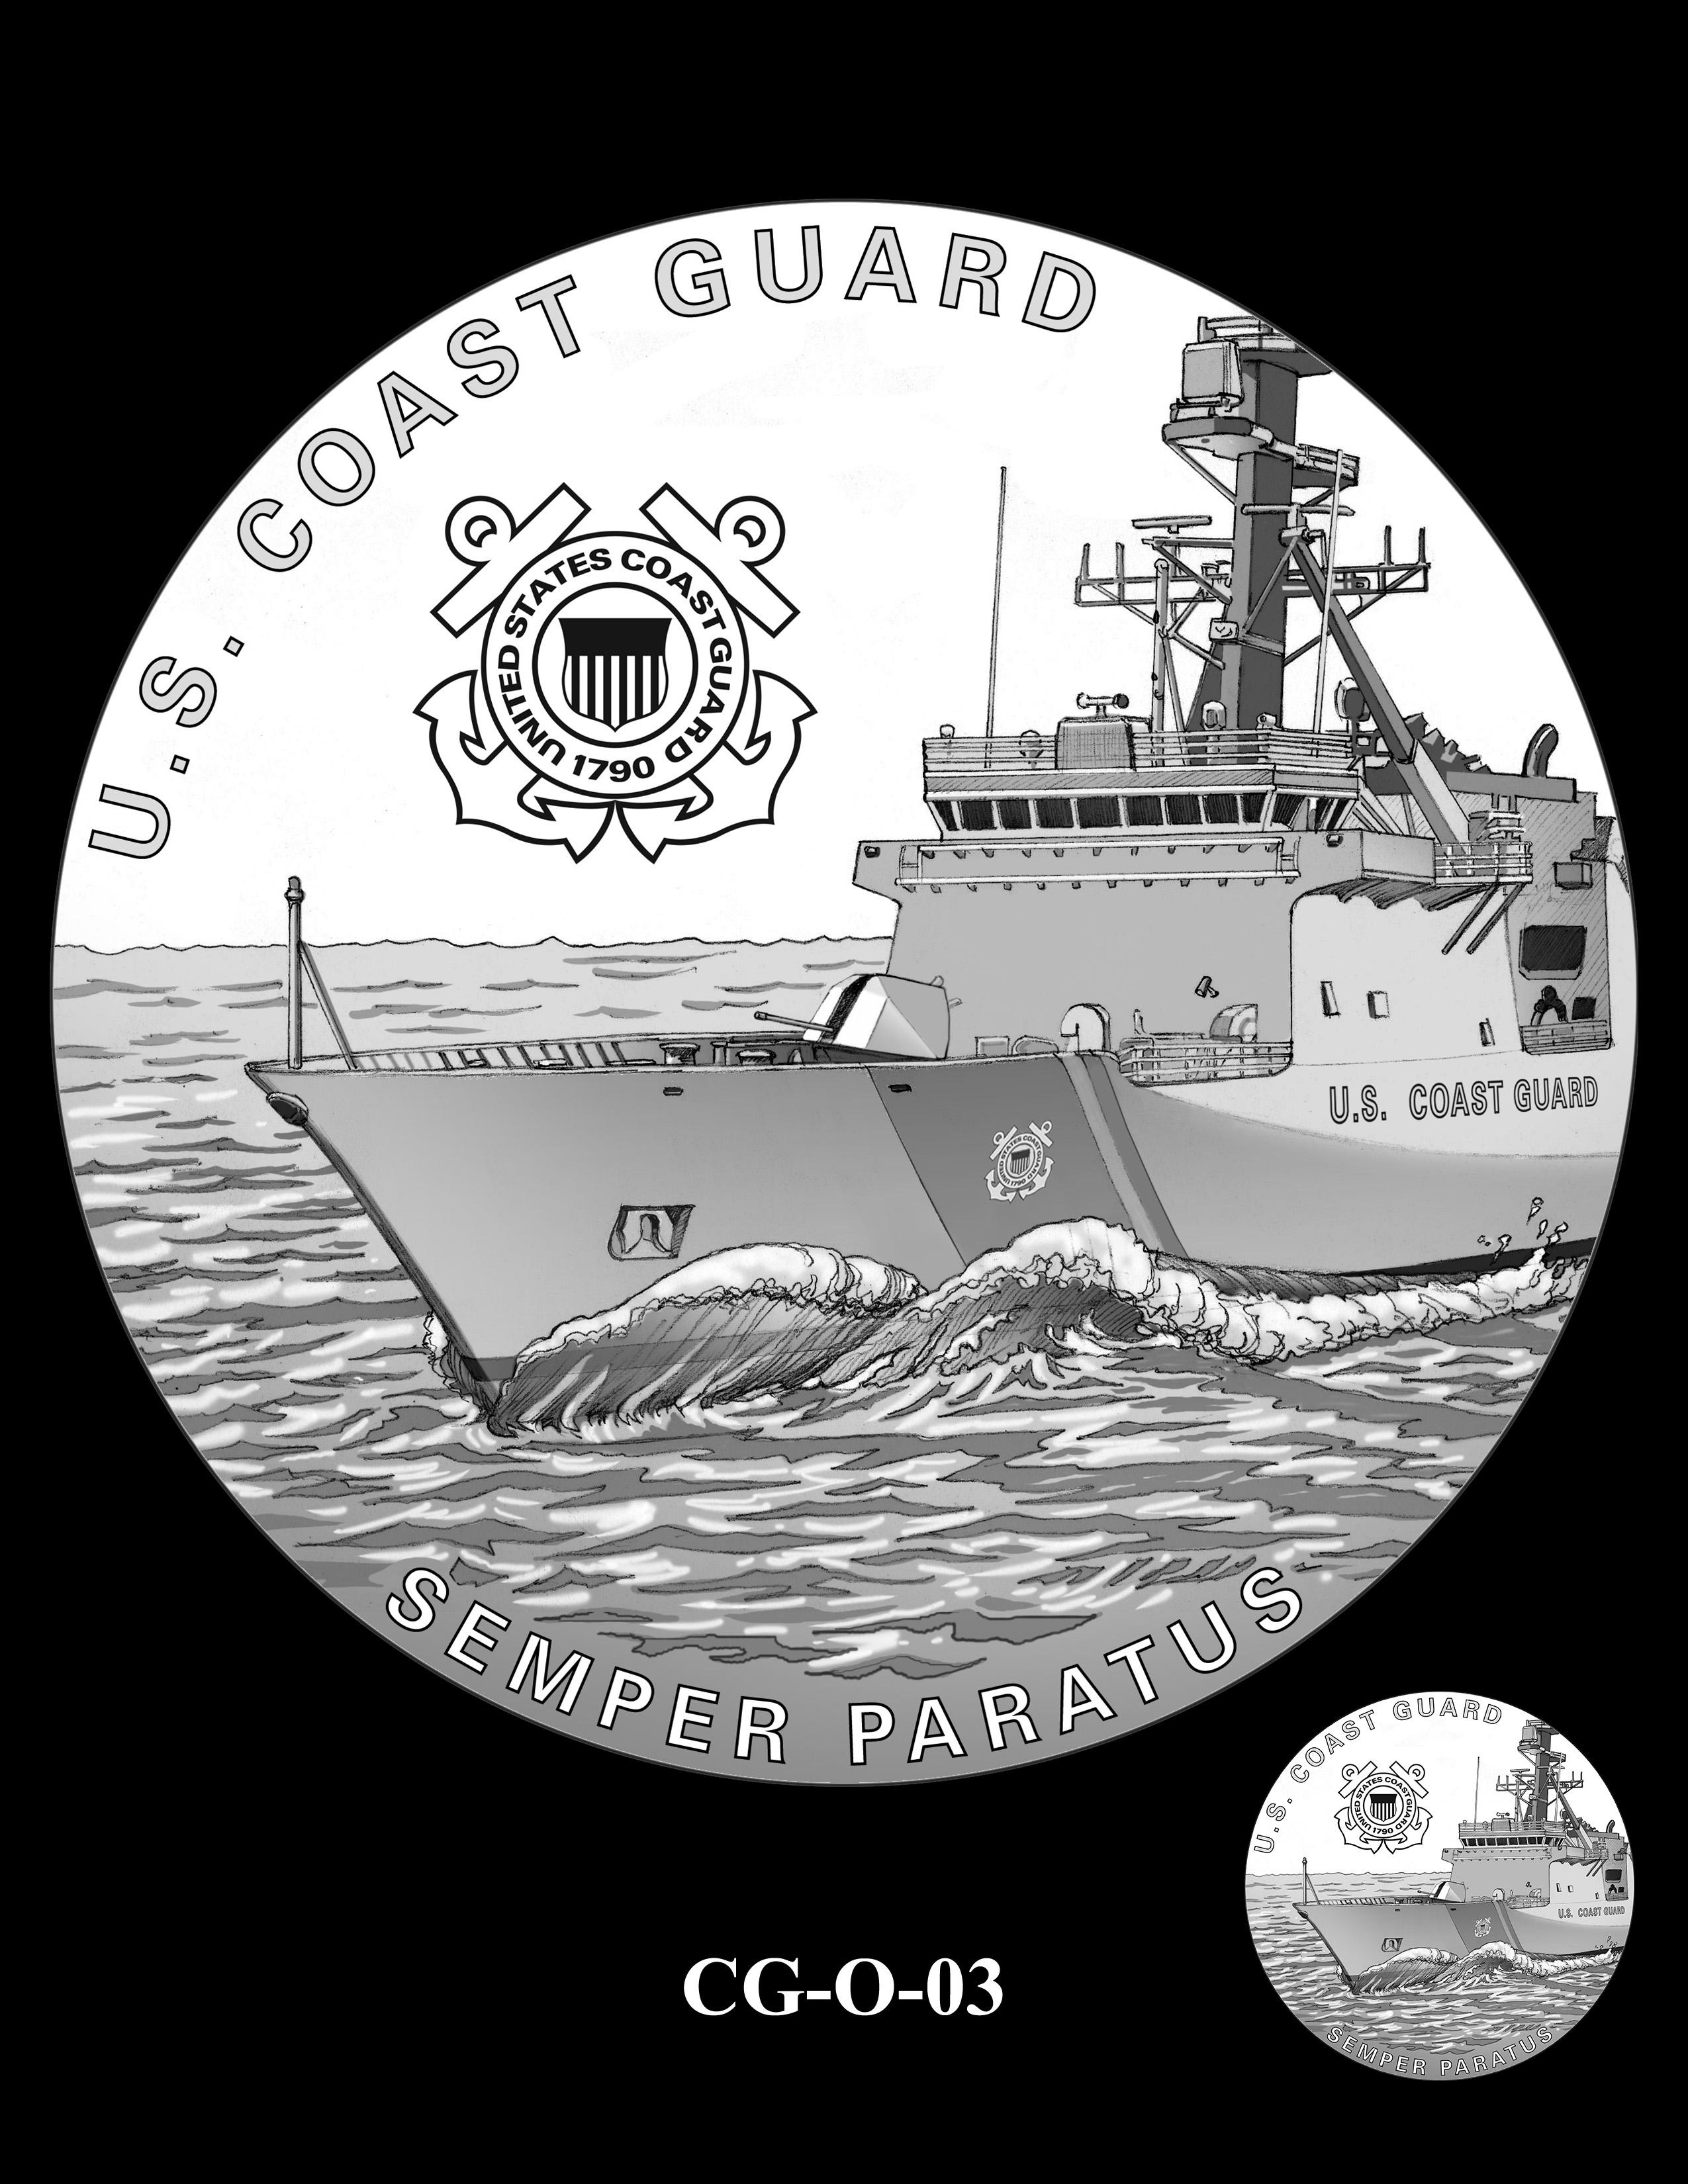 CG-O-03 -- Armed Forces Medal - Coast Guard